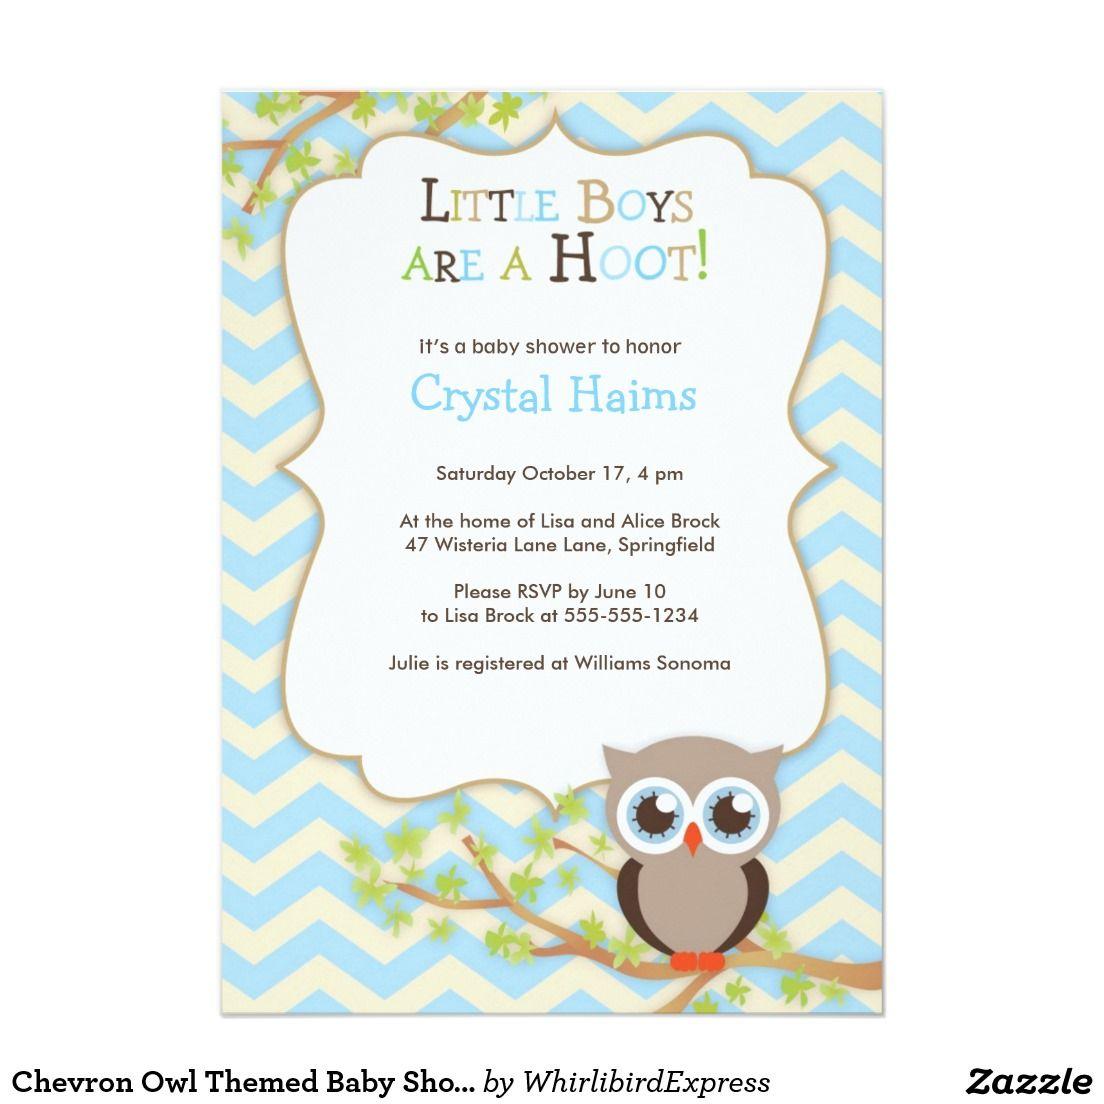 Chevron Owl Themed Baby Shower Invitations - Boy | Nursery Ideas ...